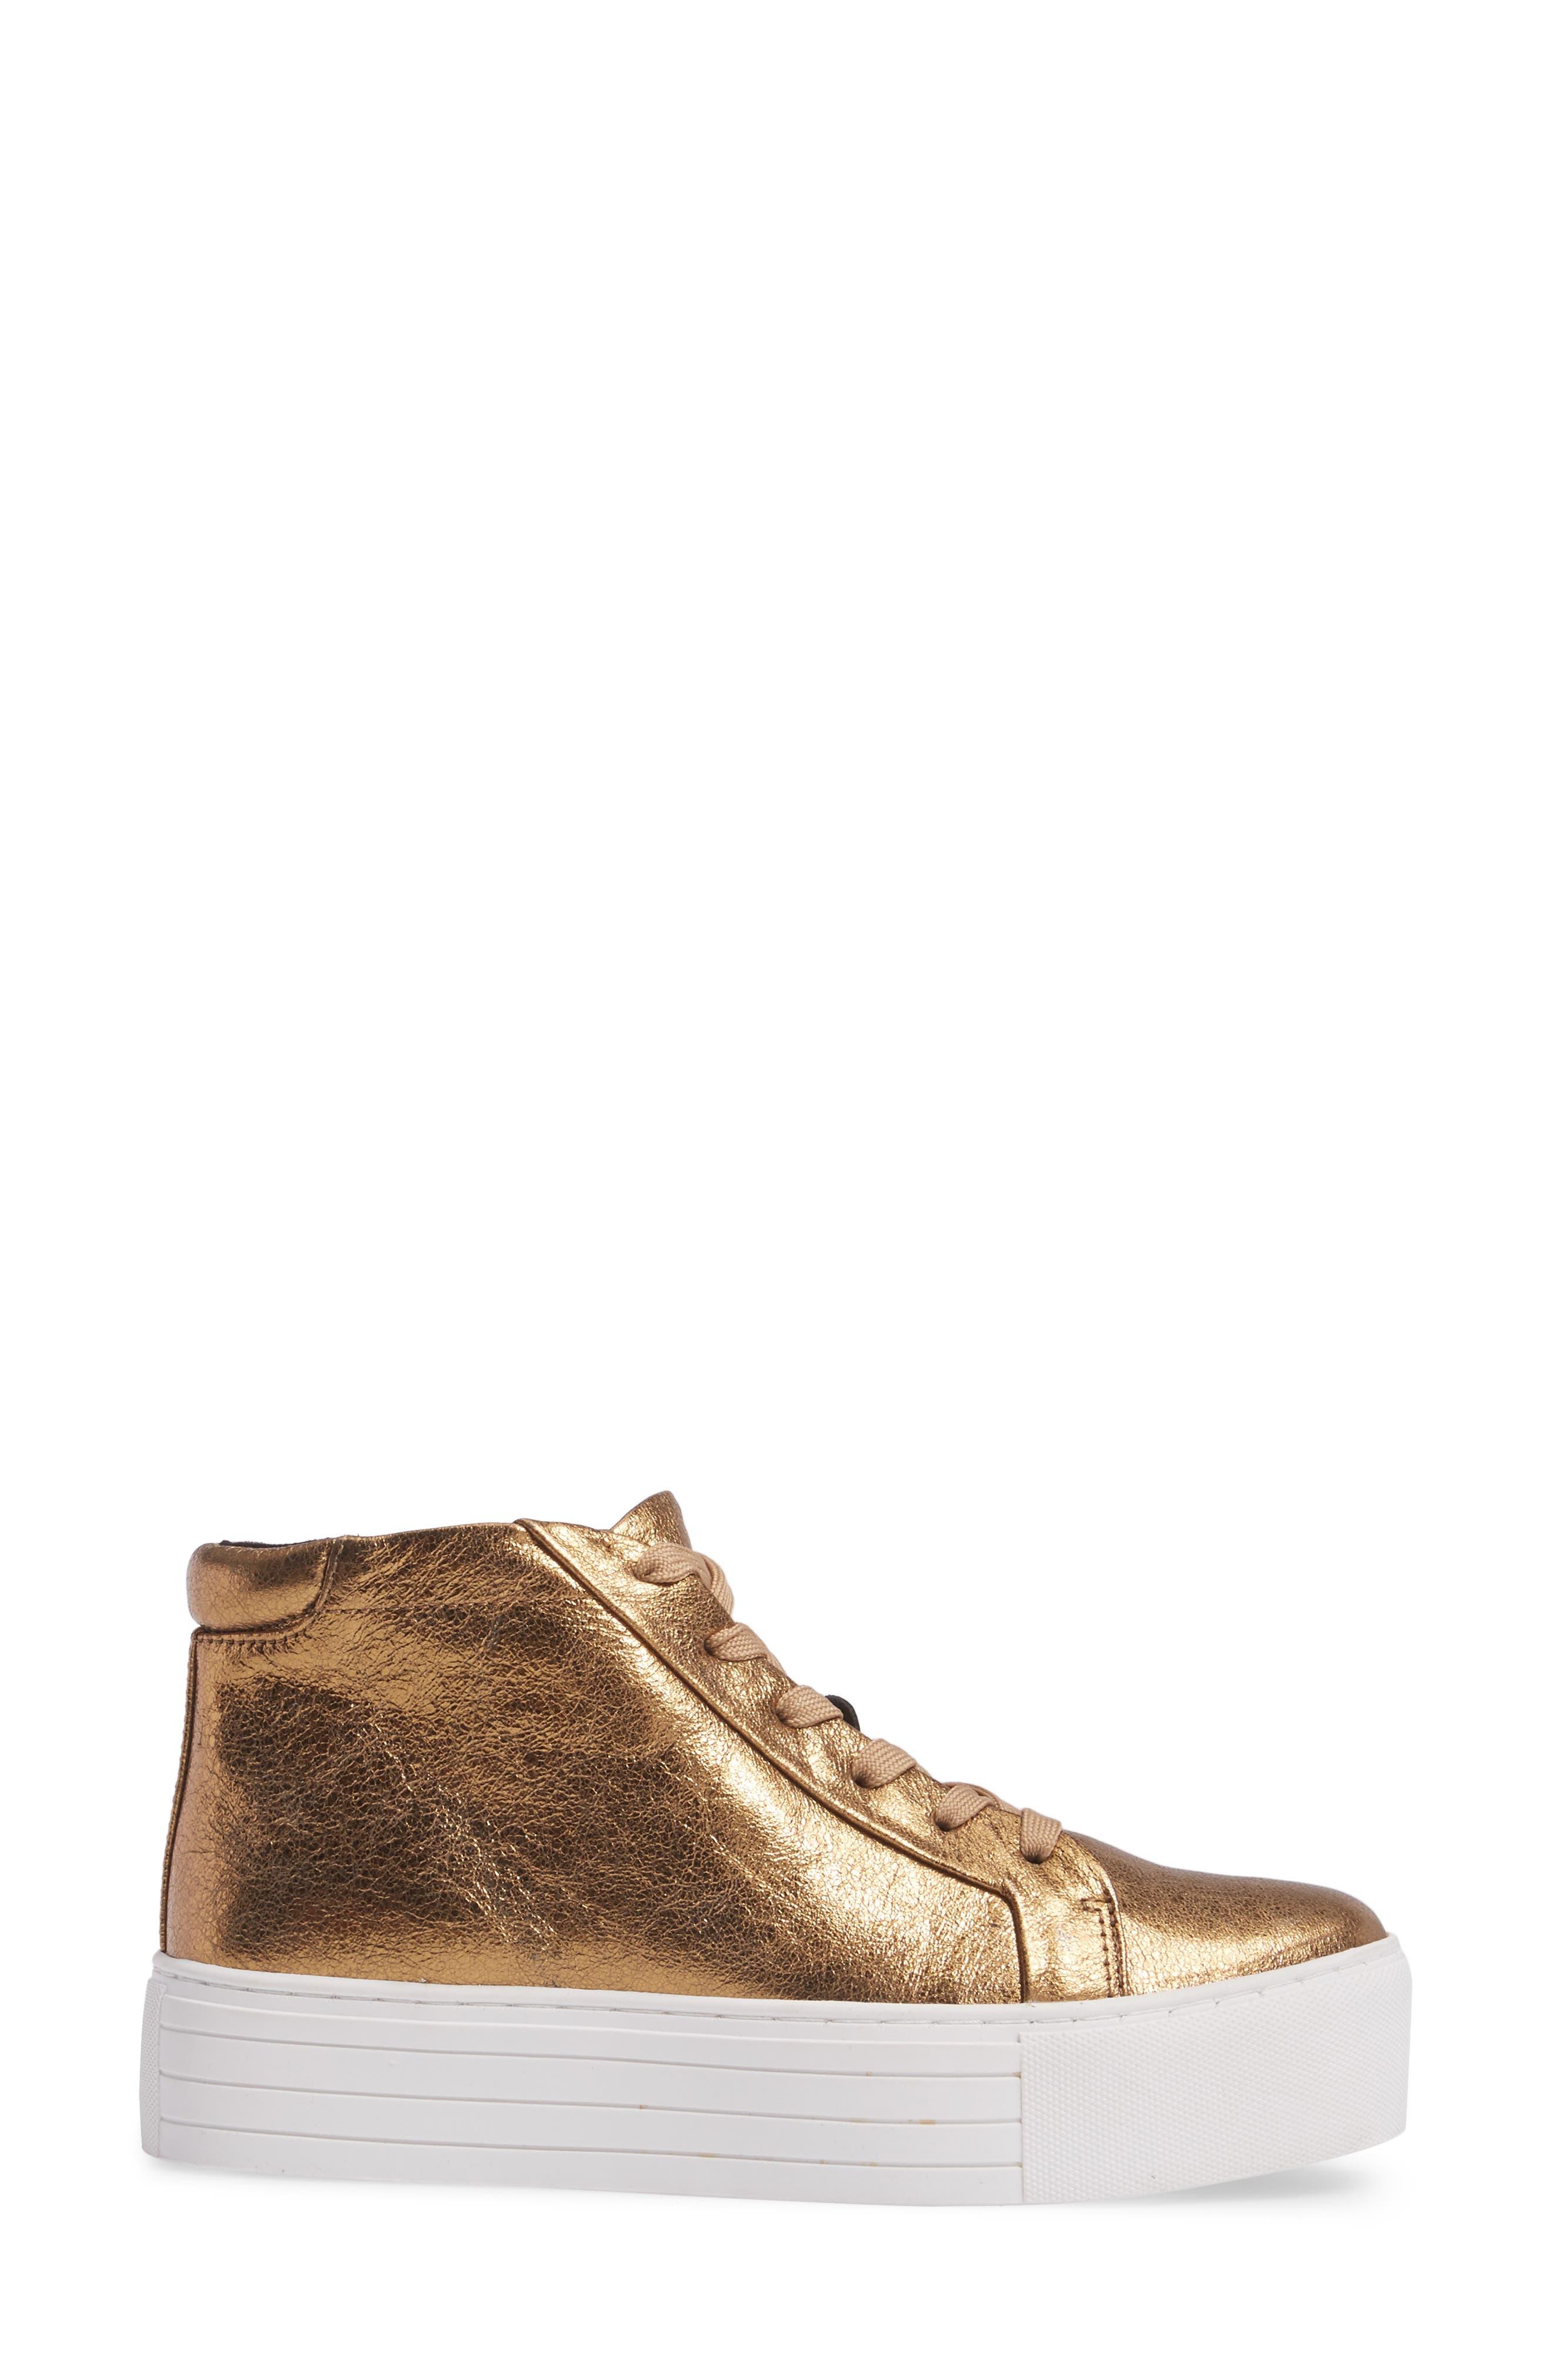 Alternate Image 3  - Kenneth Cole New York Janette High Top Platform Sneaker (Women)